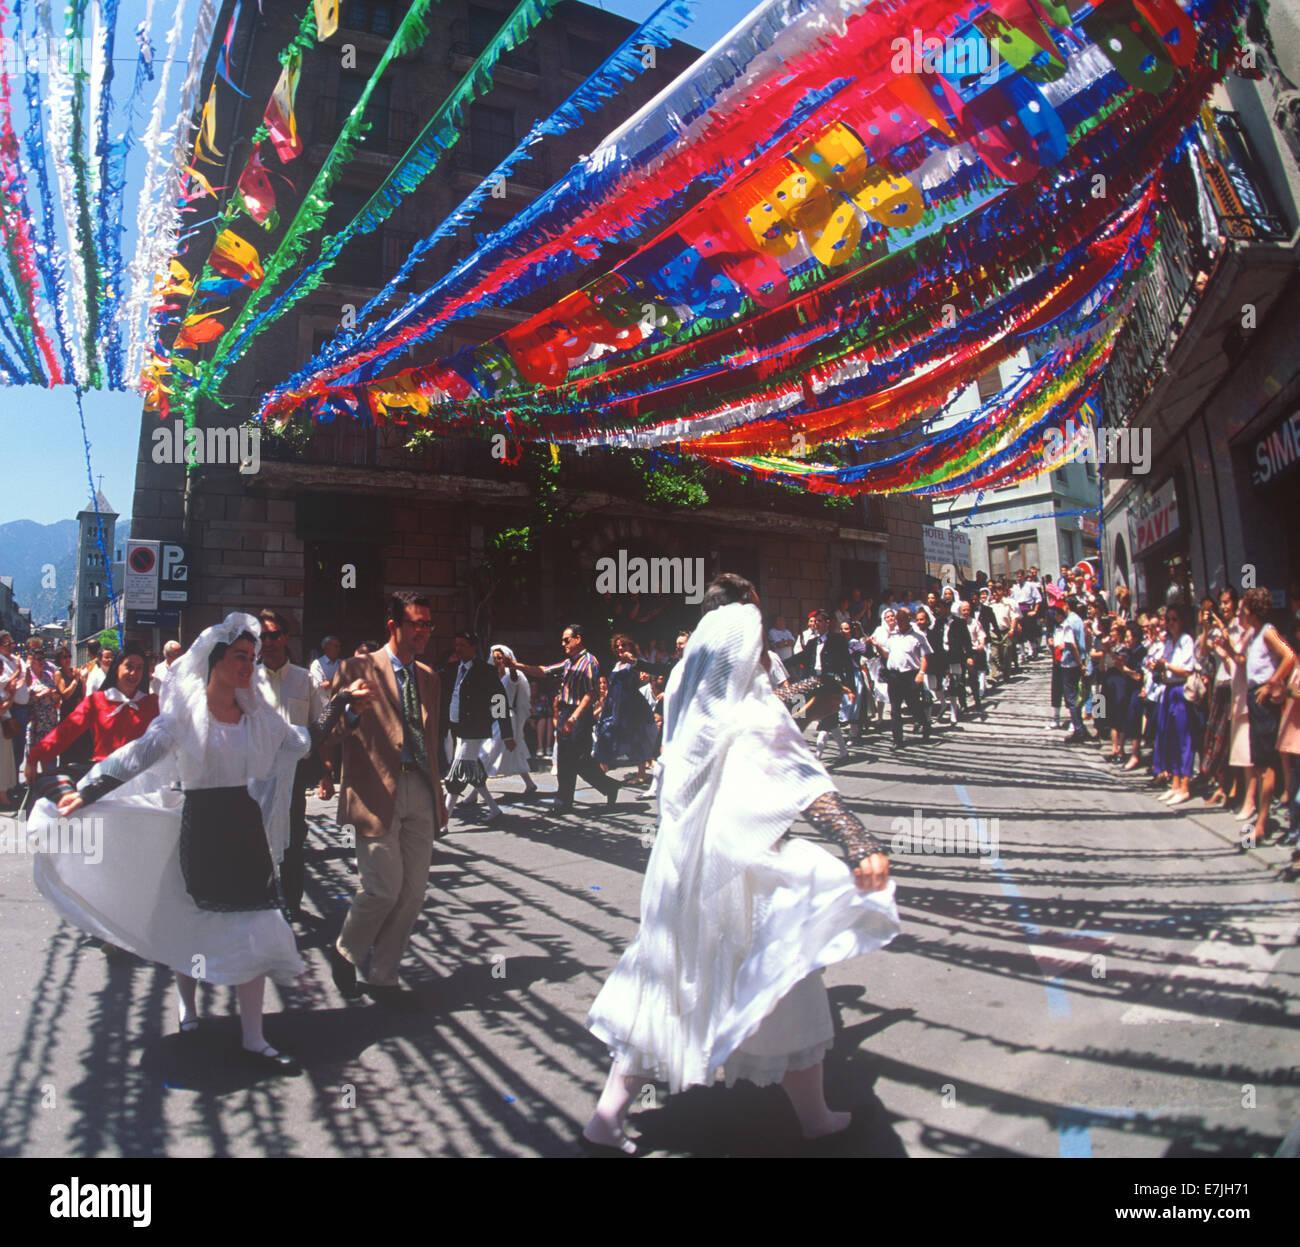 Folkloric Dancing, Escalder-Engordany, Andorra - Stock Image